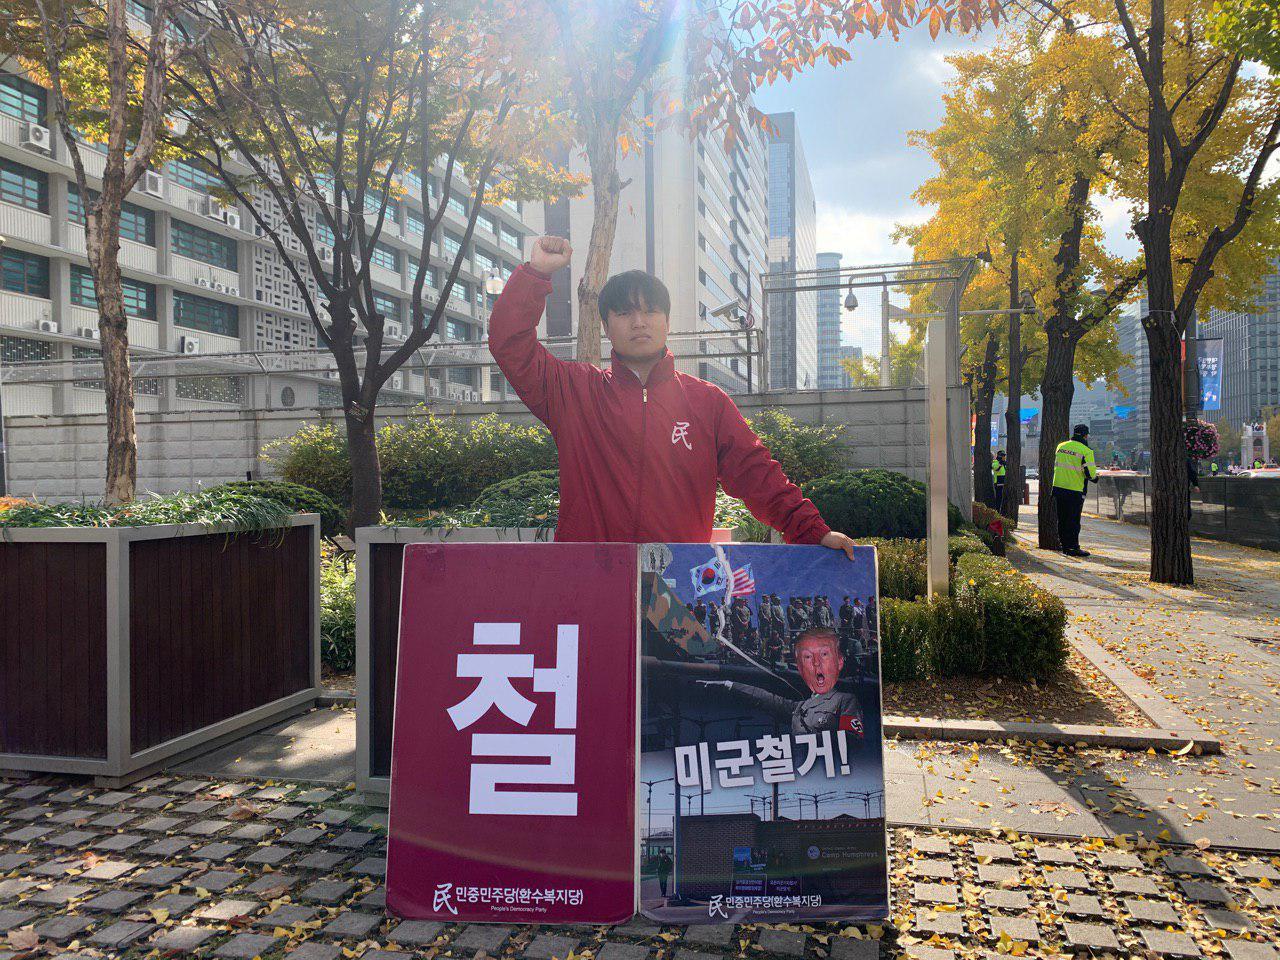 photo_2019-11-11_04-44-27.jpg